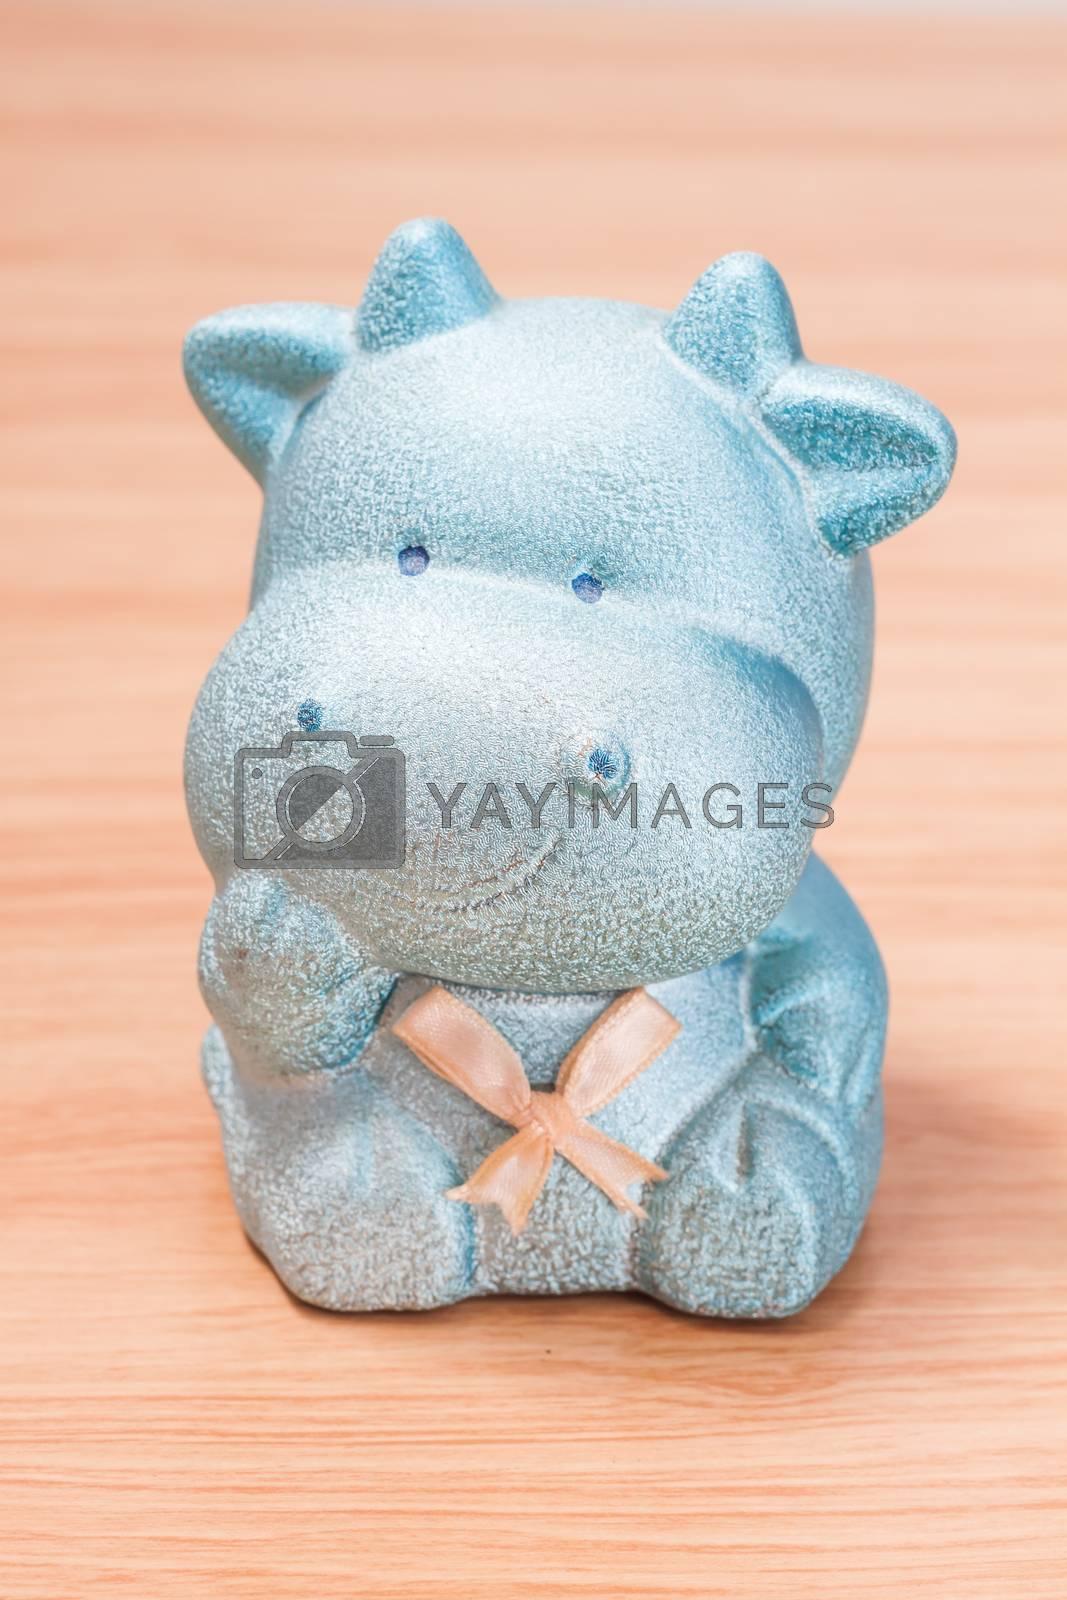 Royalty free image of Green cow doll saving box by punsayaporn